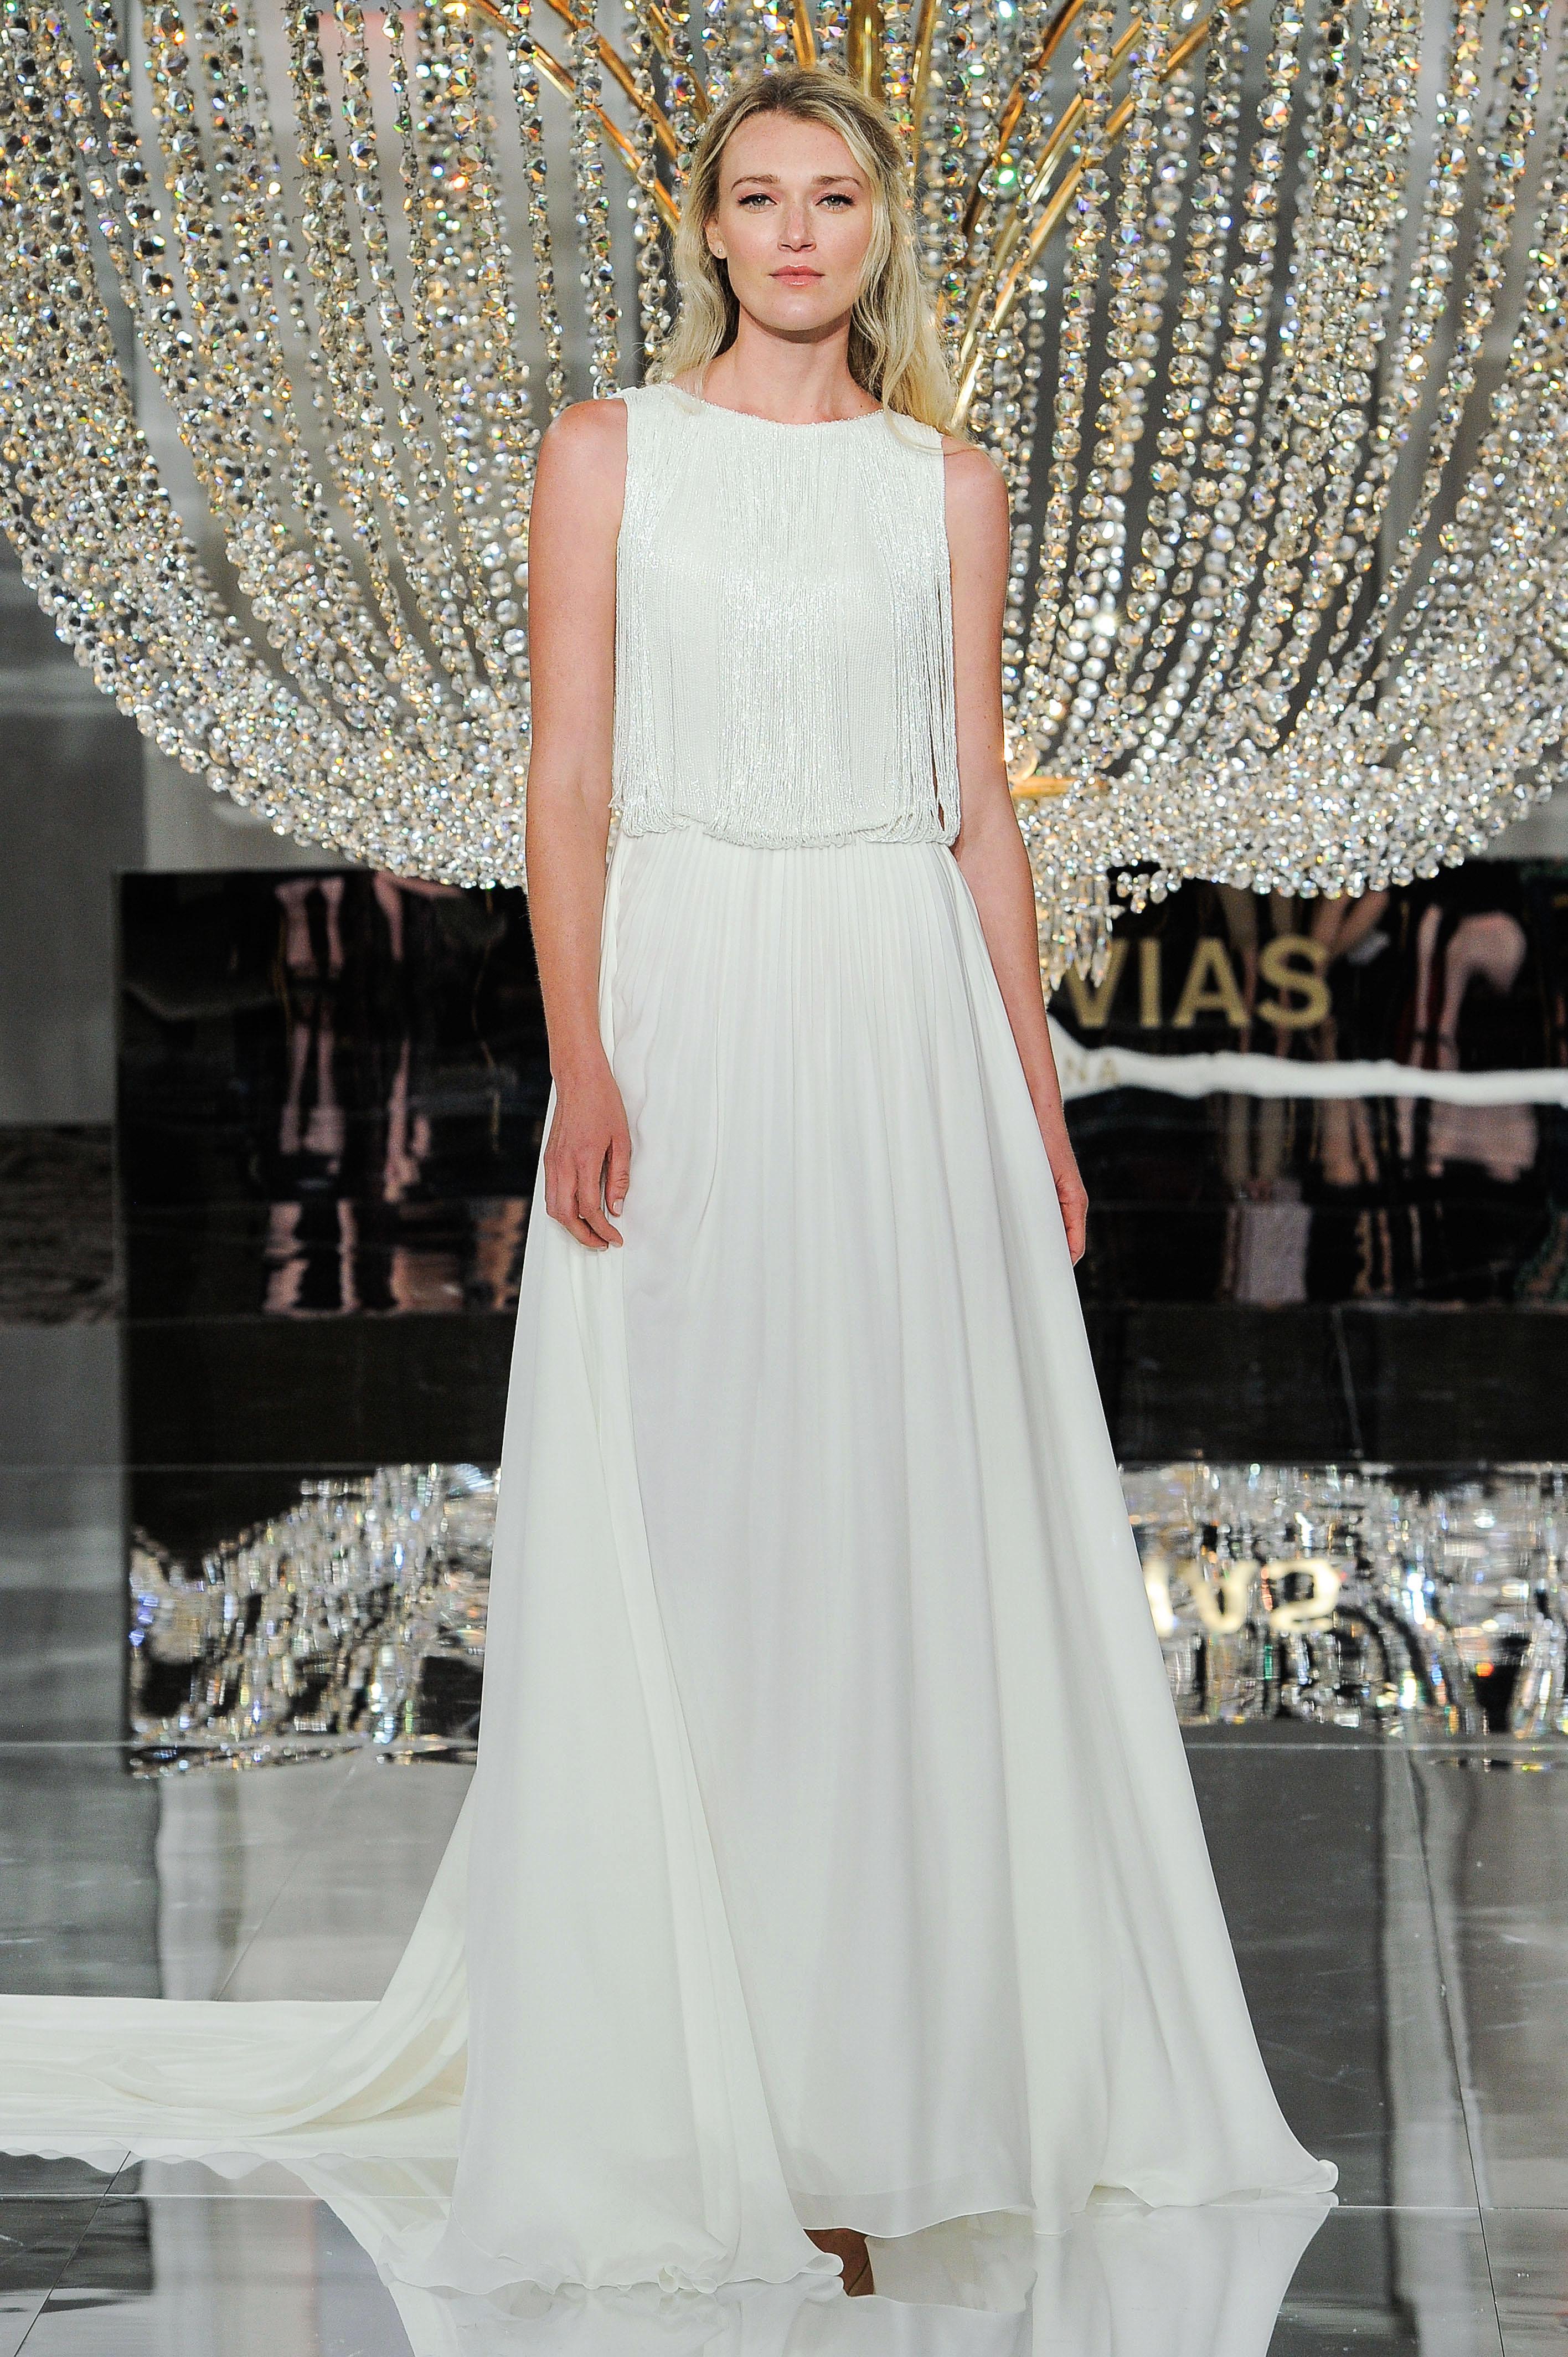 pronovias wedding dress fall 2018 sleeveless a-line loose